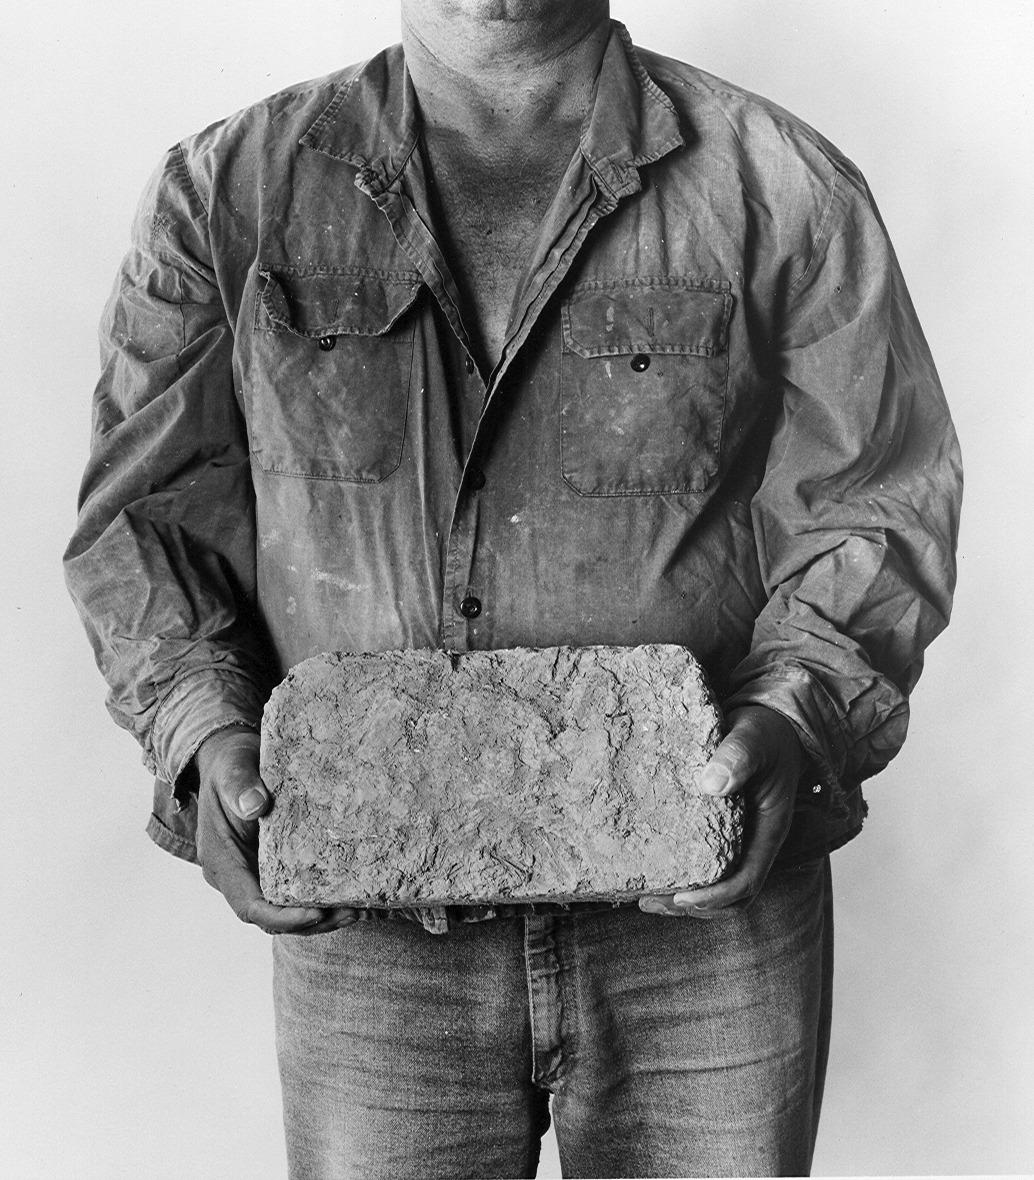 דב הלר, לס, 1978